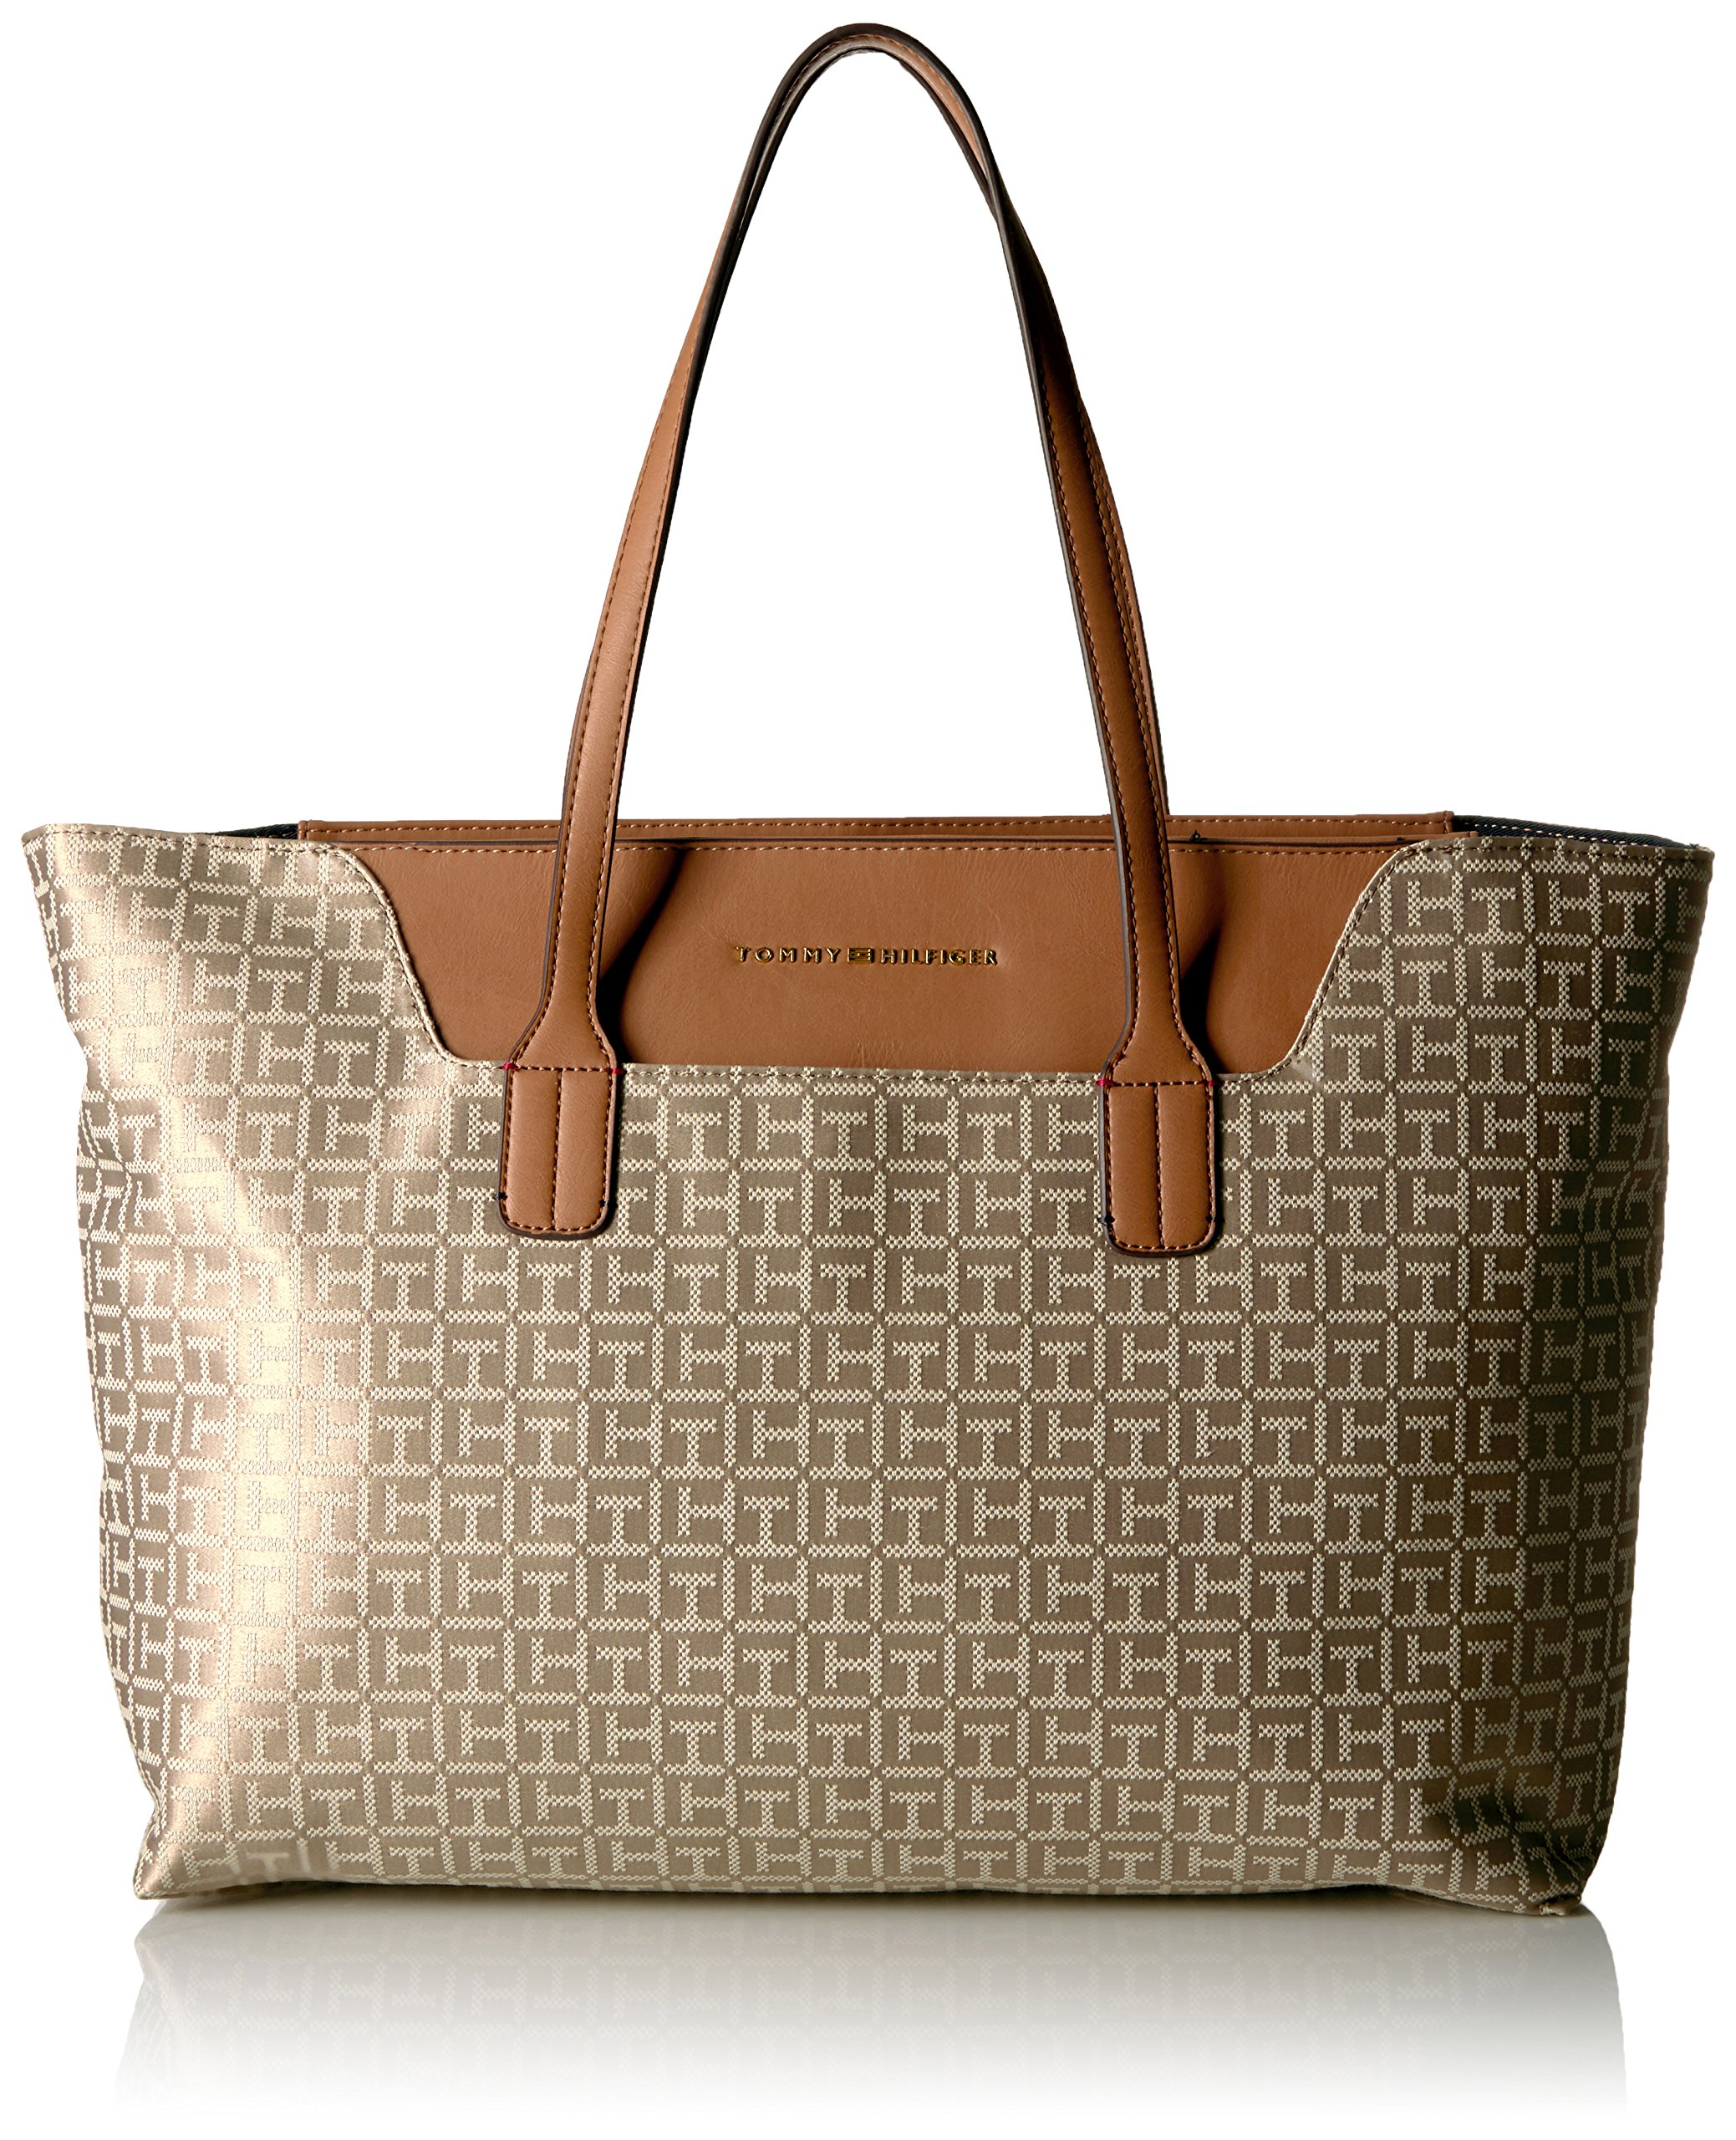 Tommy Hilfiger Tote Bag for Women Adamaria Jacquard, Khaki Tonal by Tommy Hilfiger